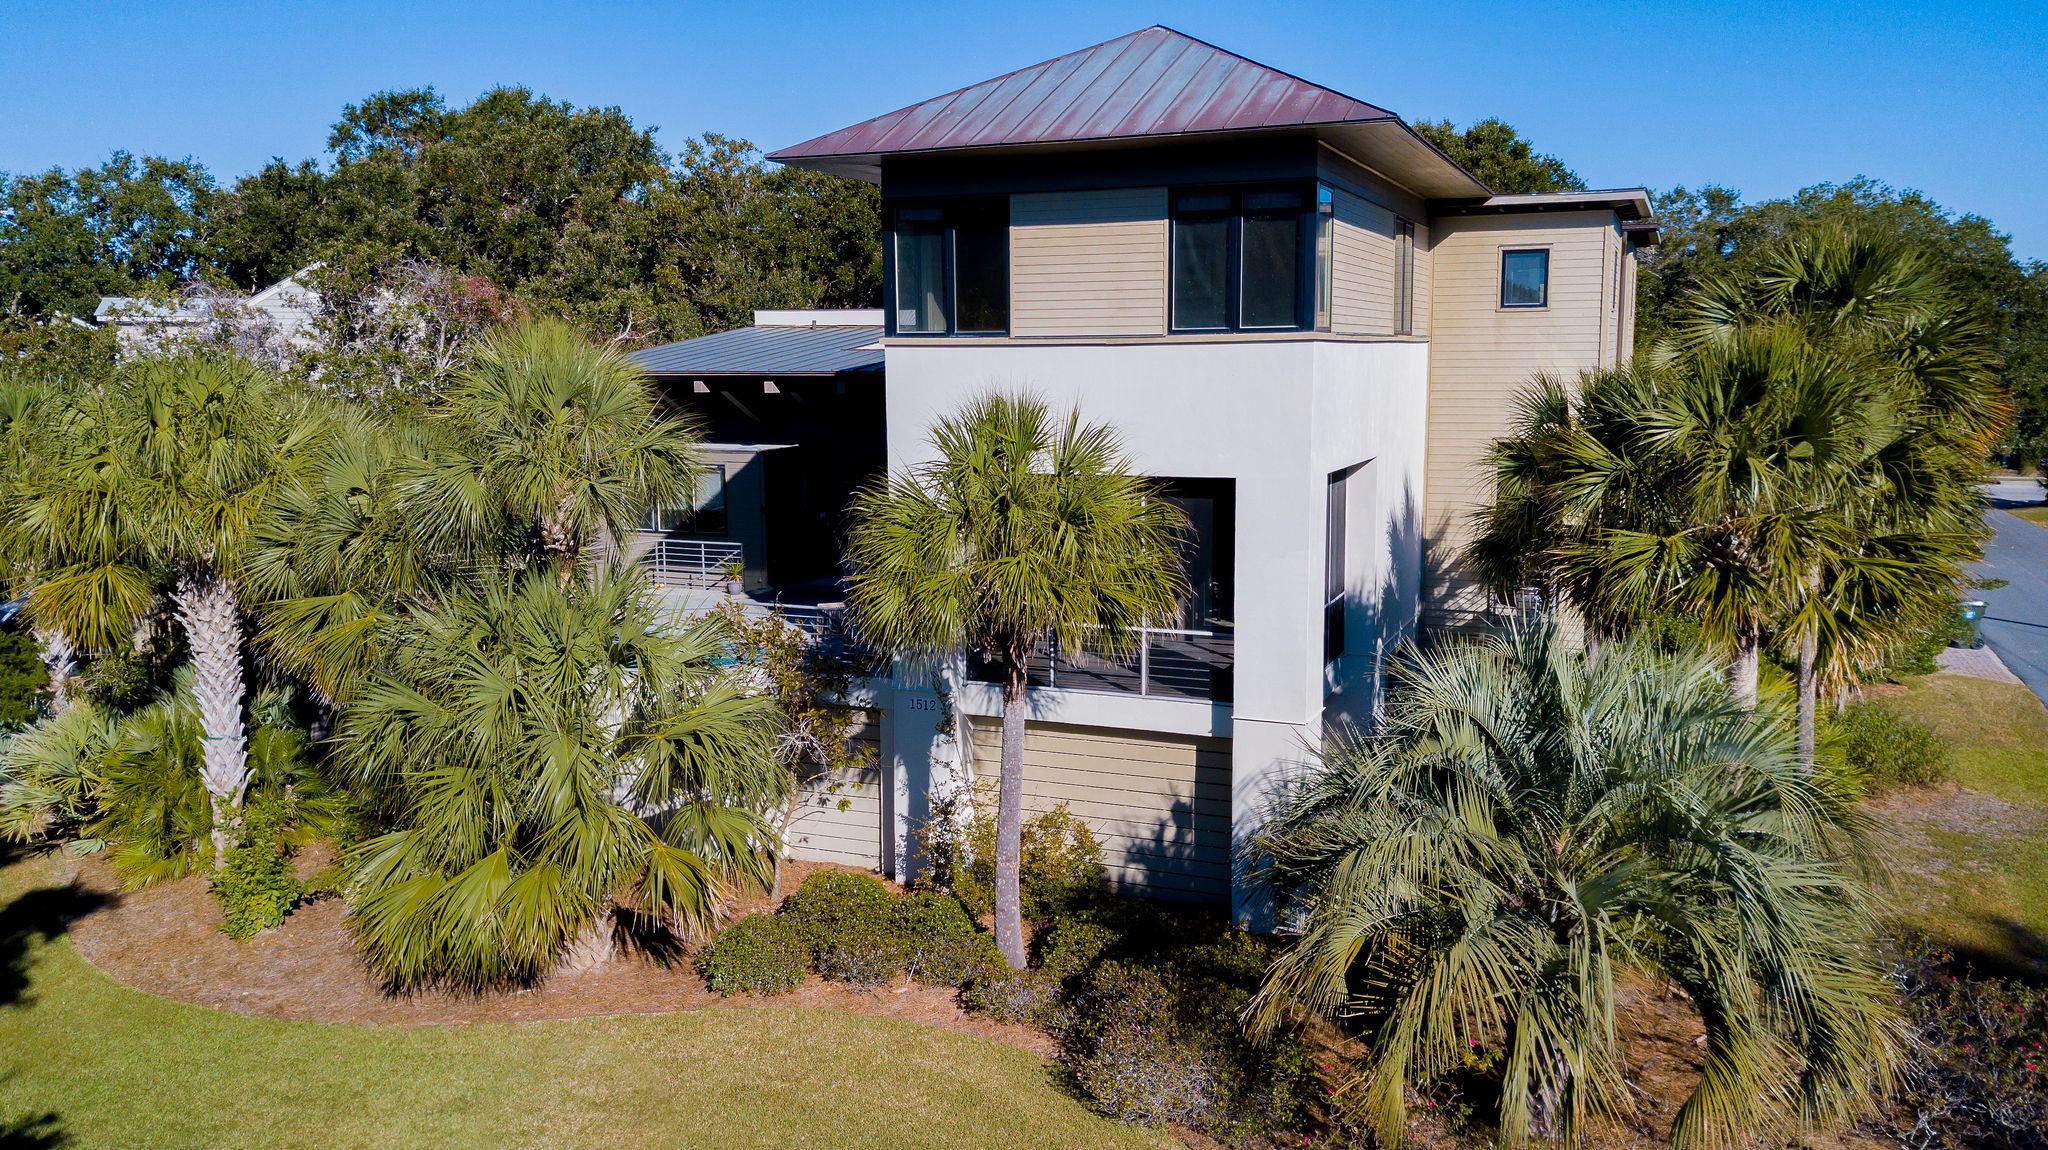 Sullivans Island Homes For Sale - 1512 Poe, Sullivans Island, SC - 26